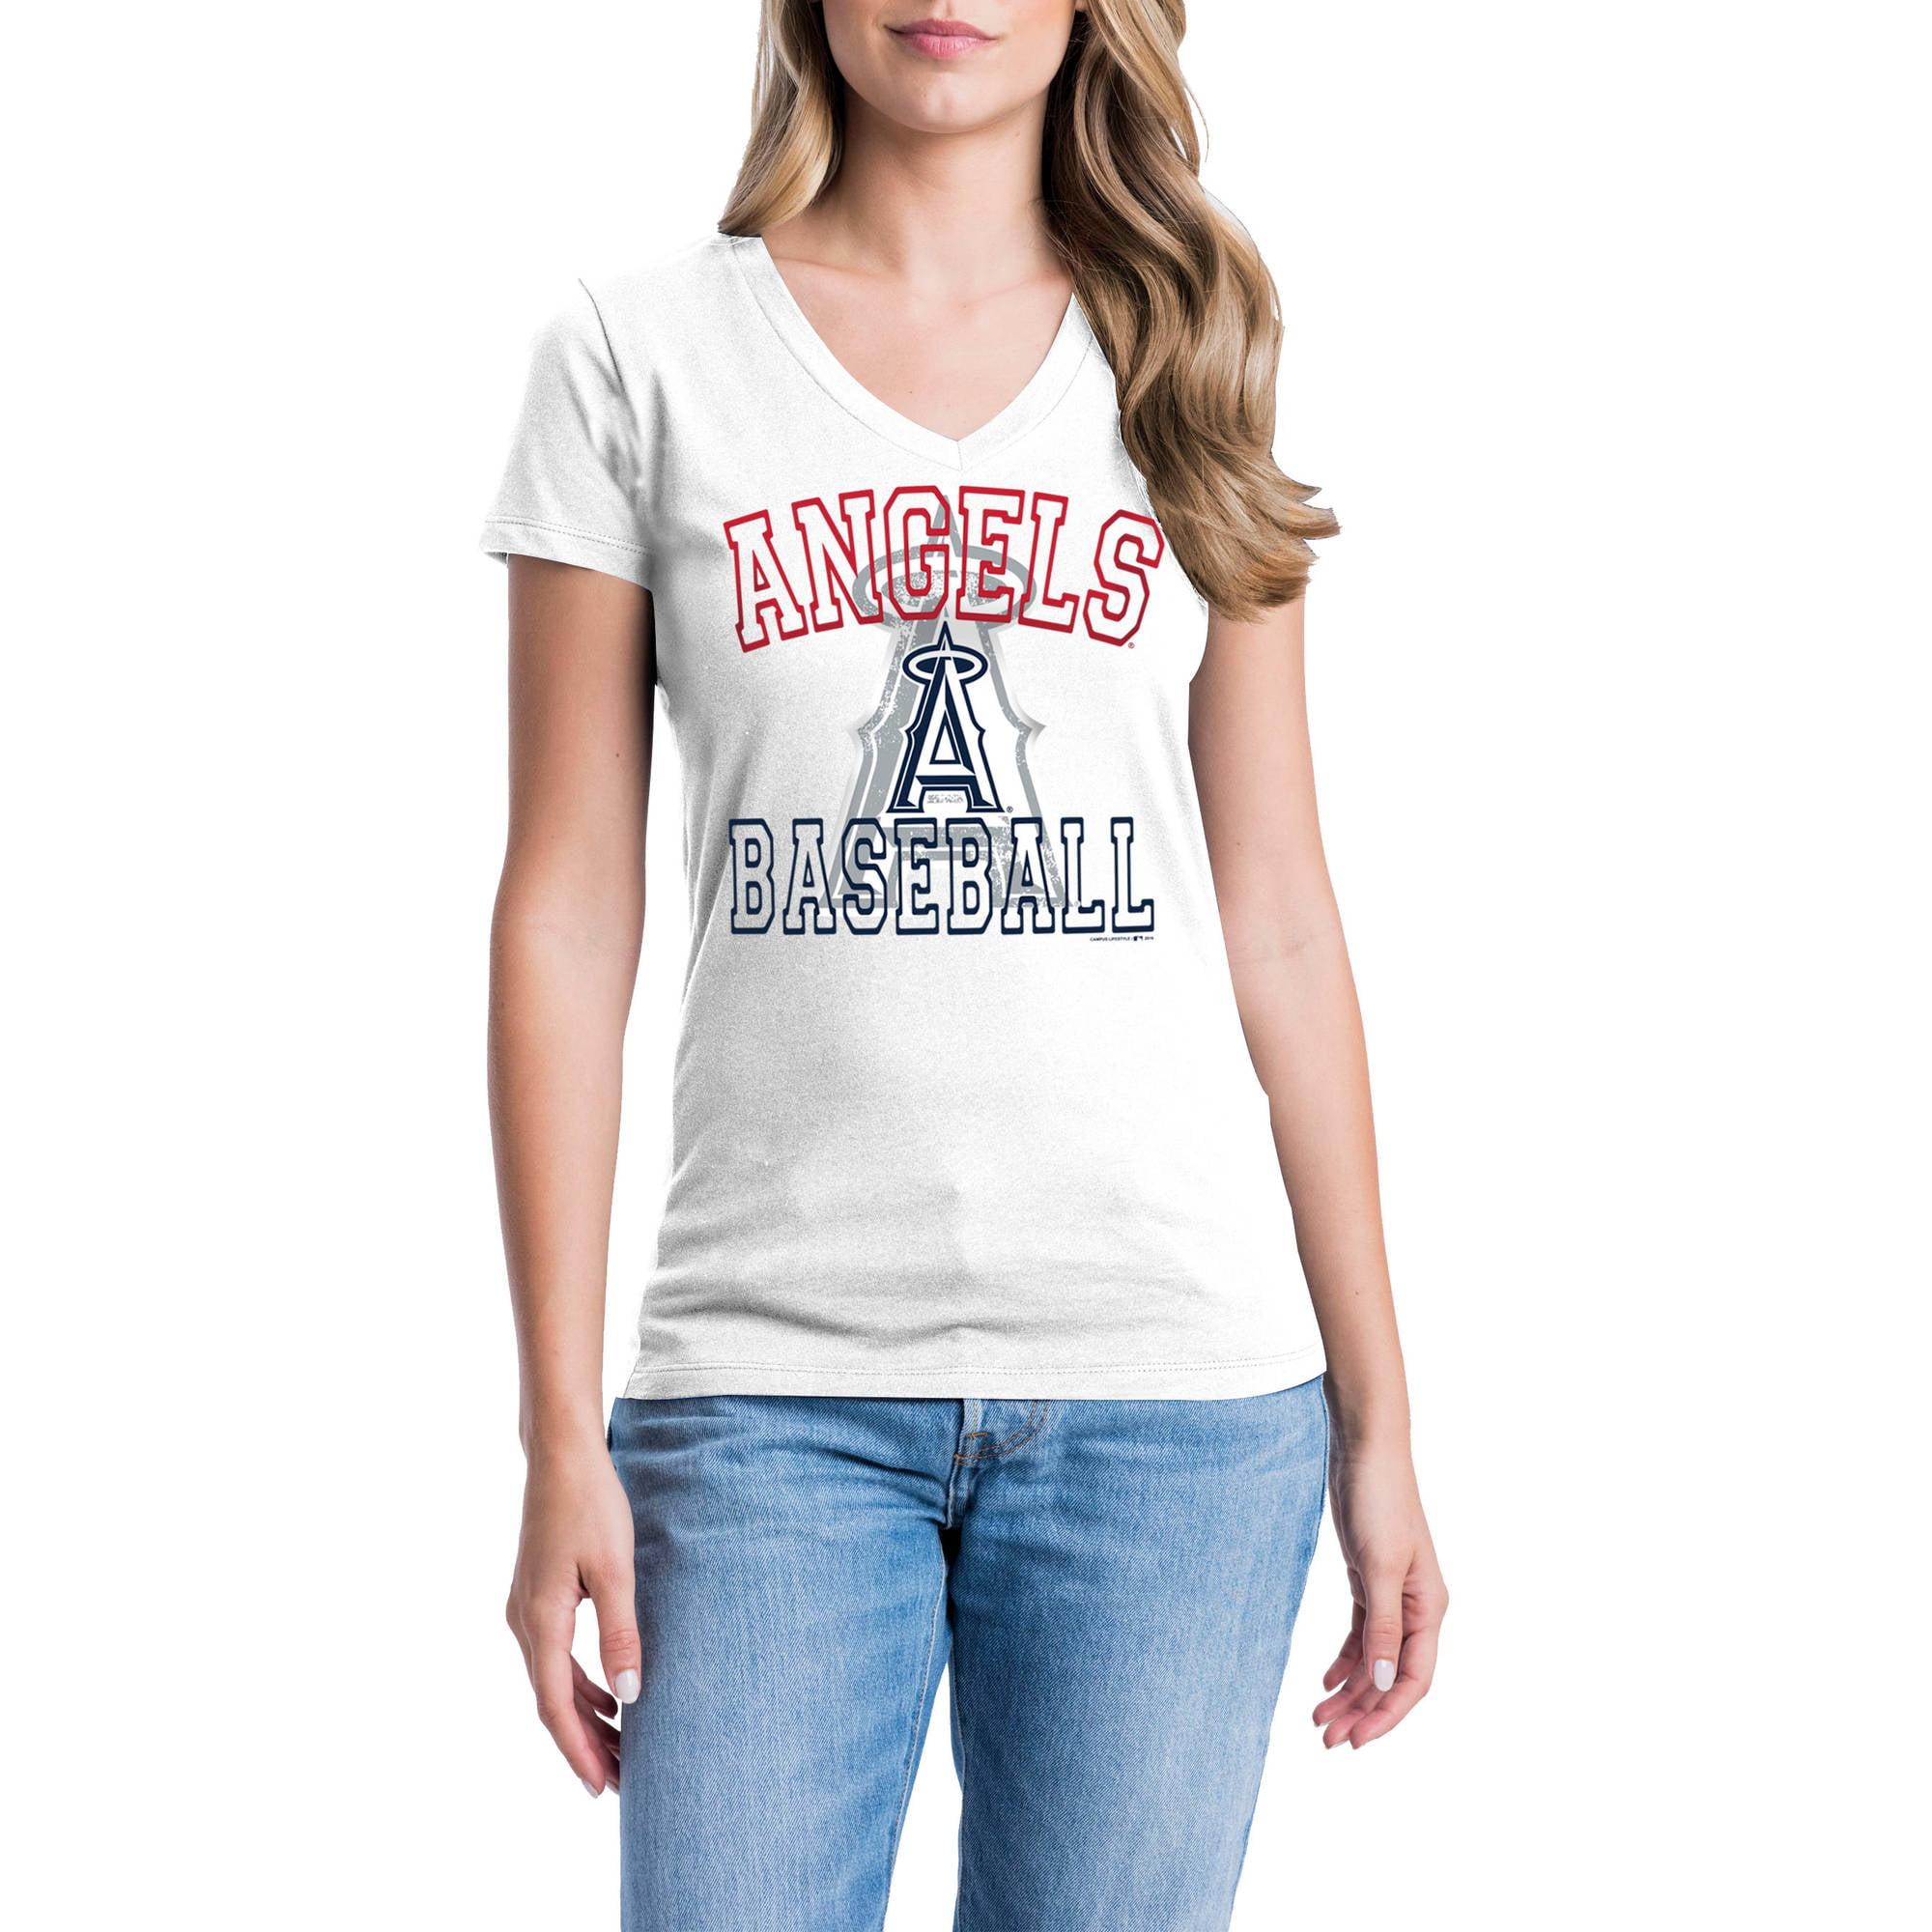 Los Angeles Angels Womens Short Sleeve Graphic Tee